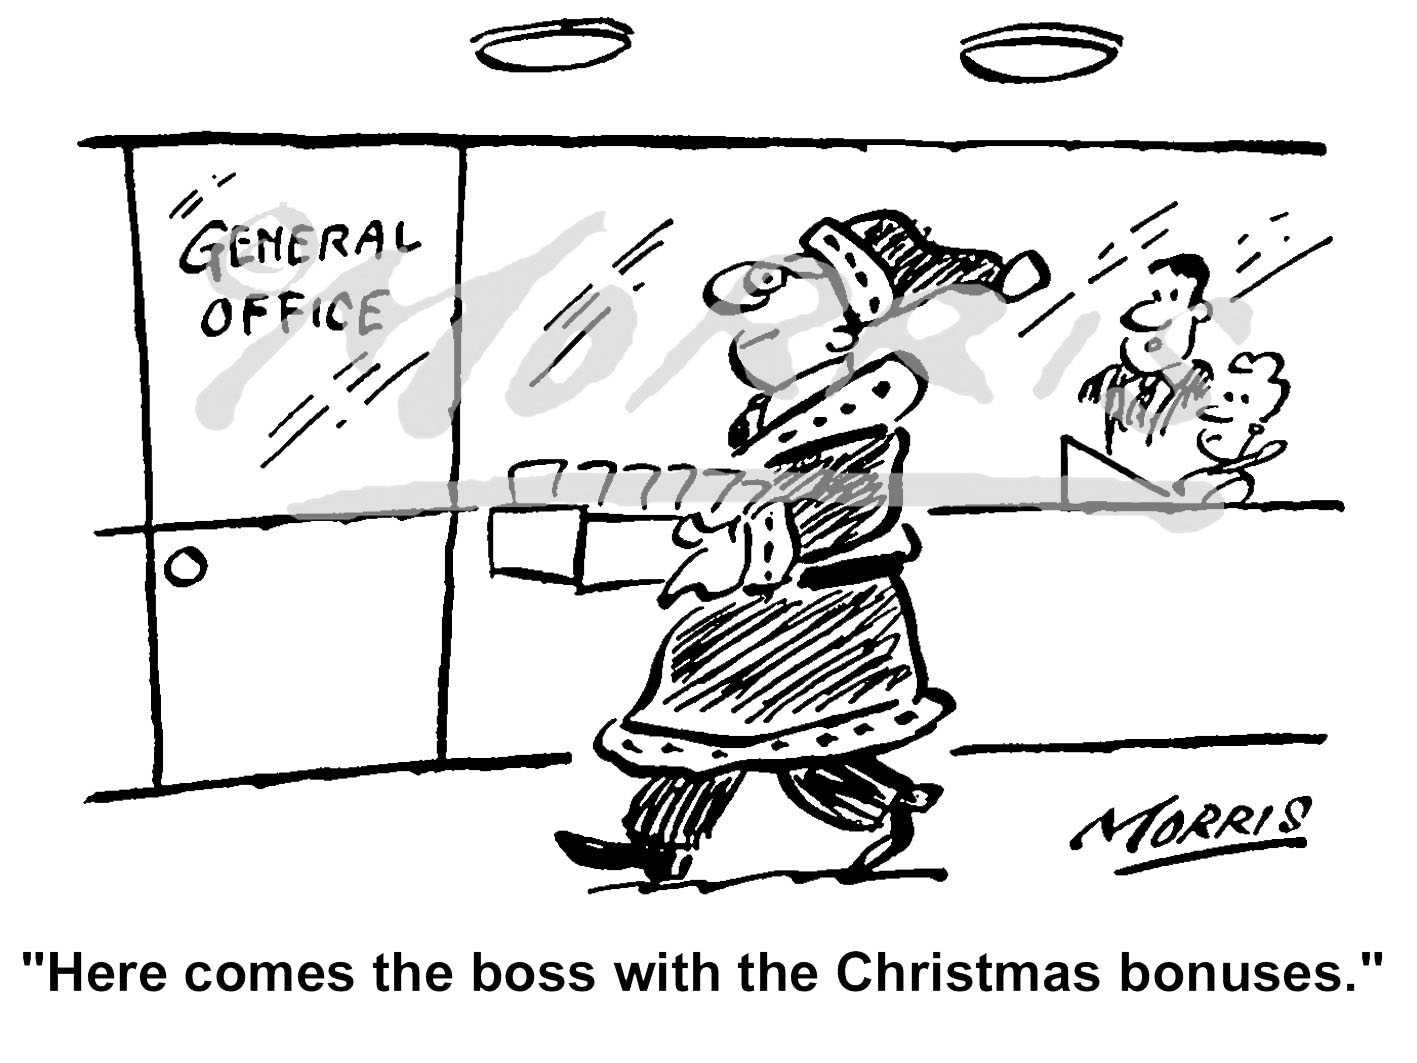 Office manager Christmas bonus cartoon – Ref: 0963bw